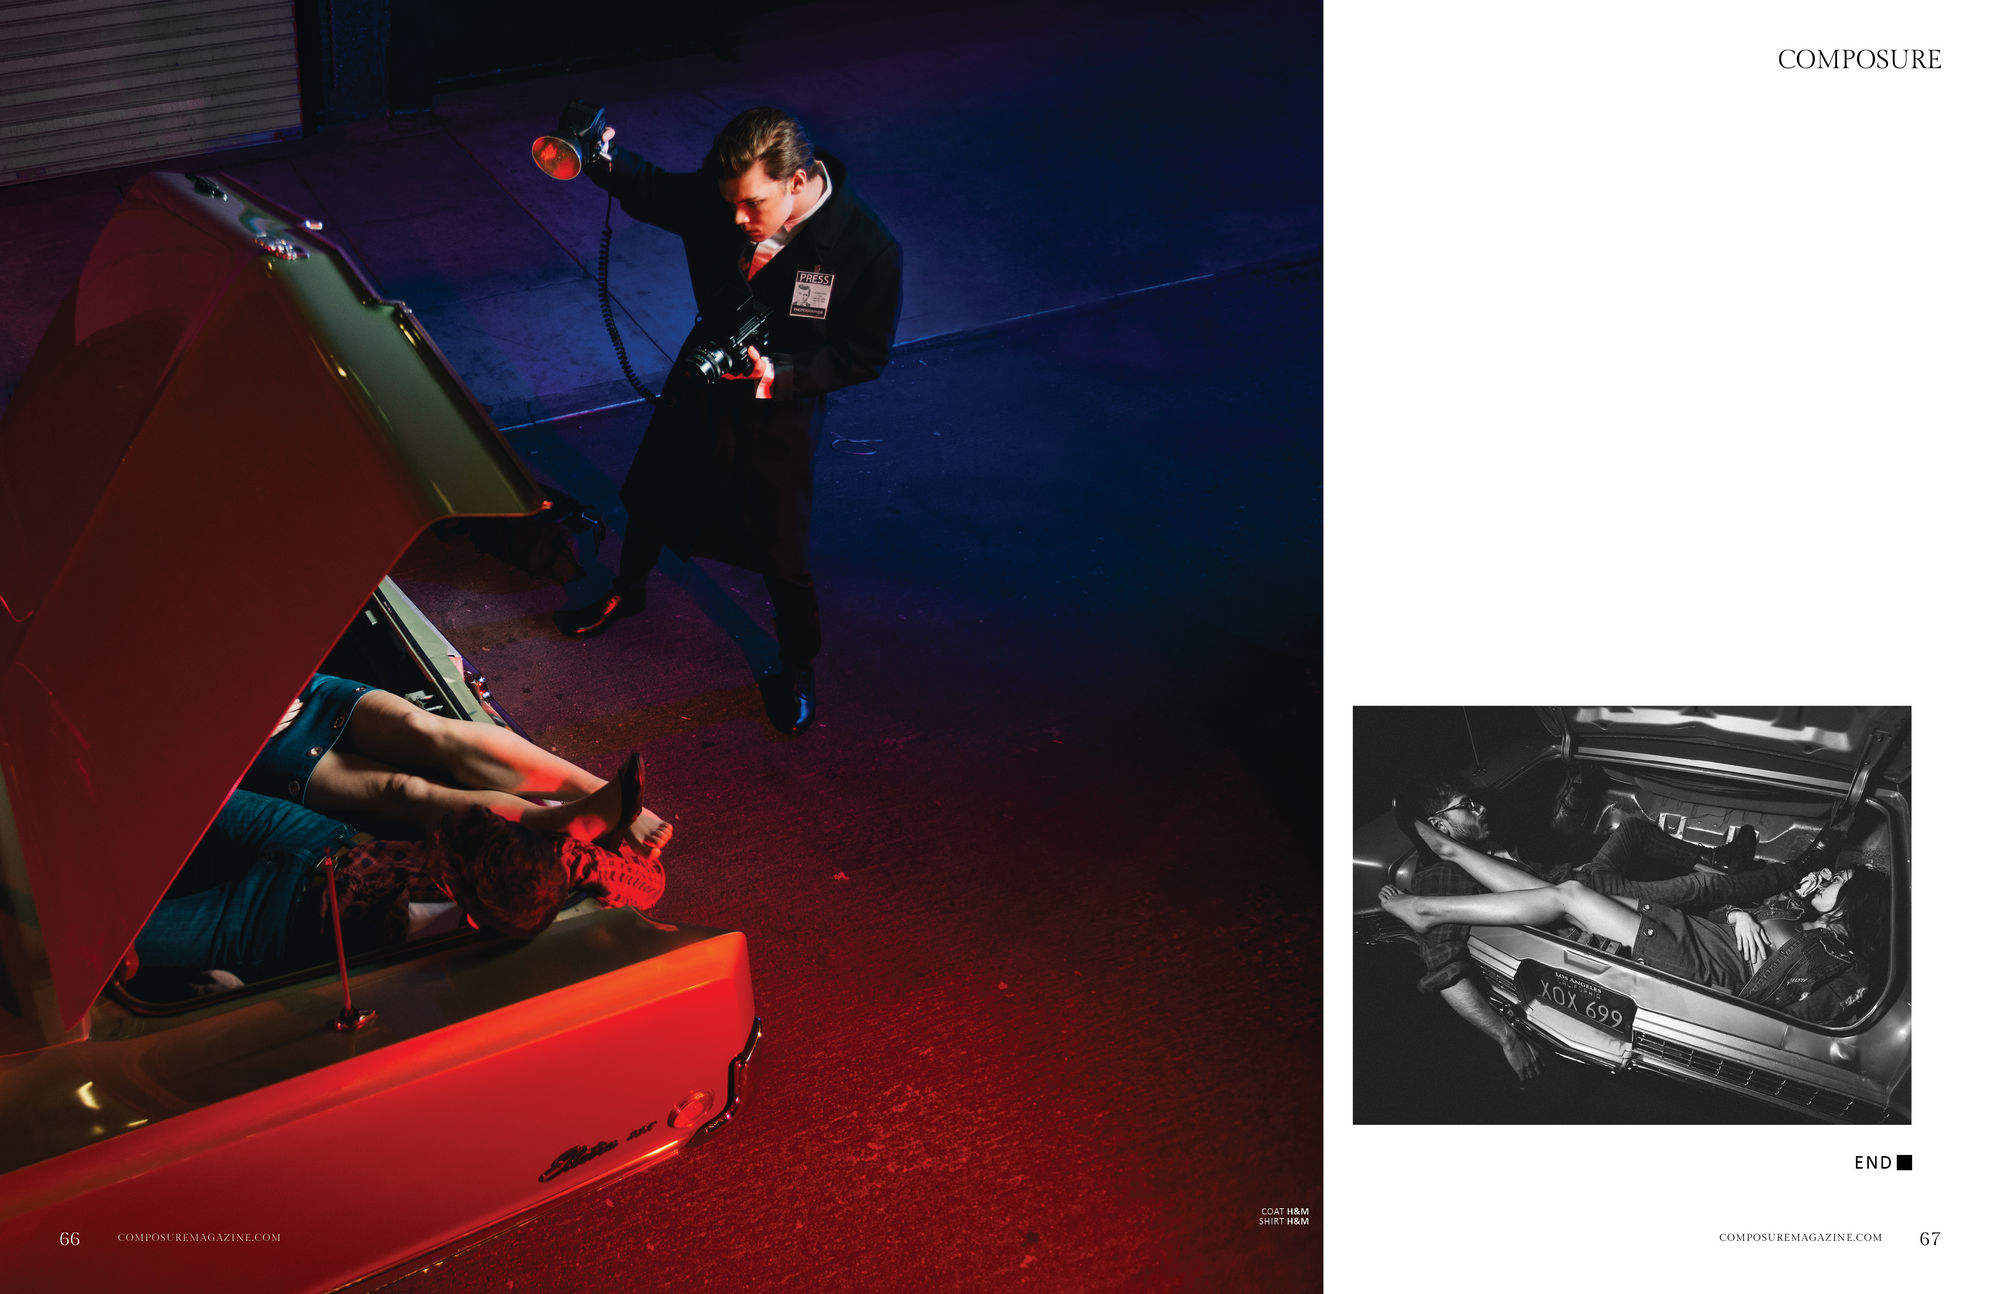 Cameron Monaghan - Composure Magazine Photoshoot - 2017